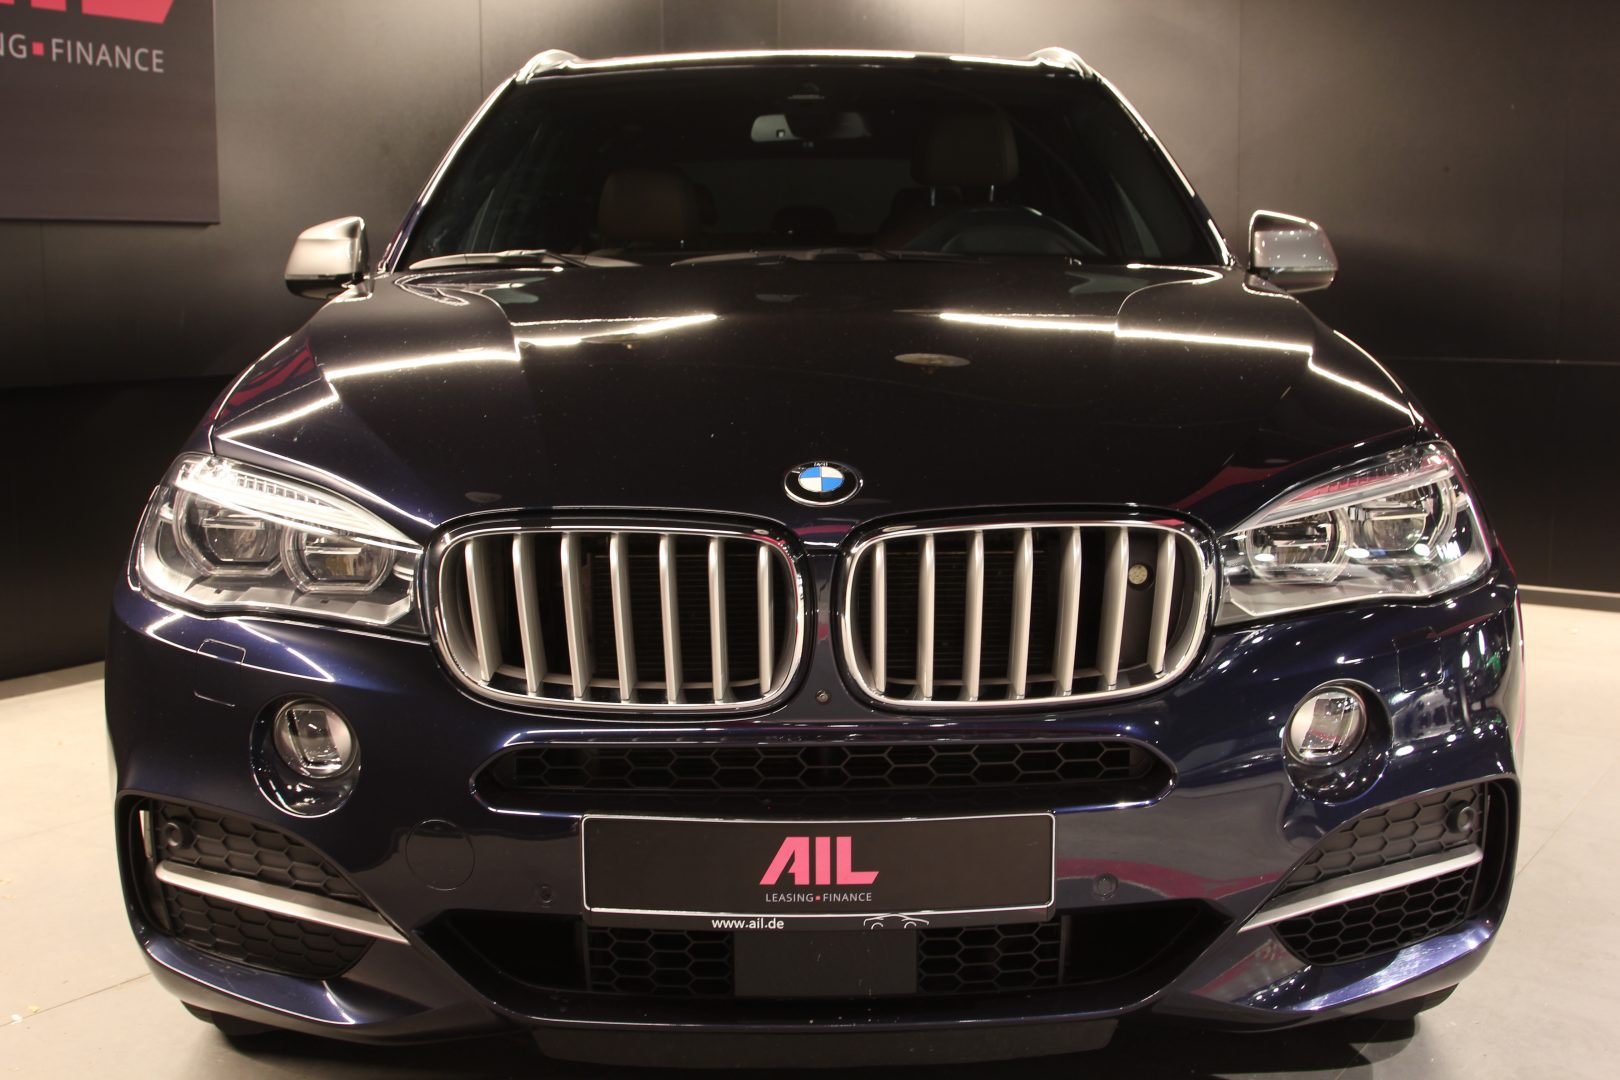 AIL BMW X5 M50d Bang & Olufsen Panorama RSE 14